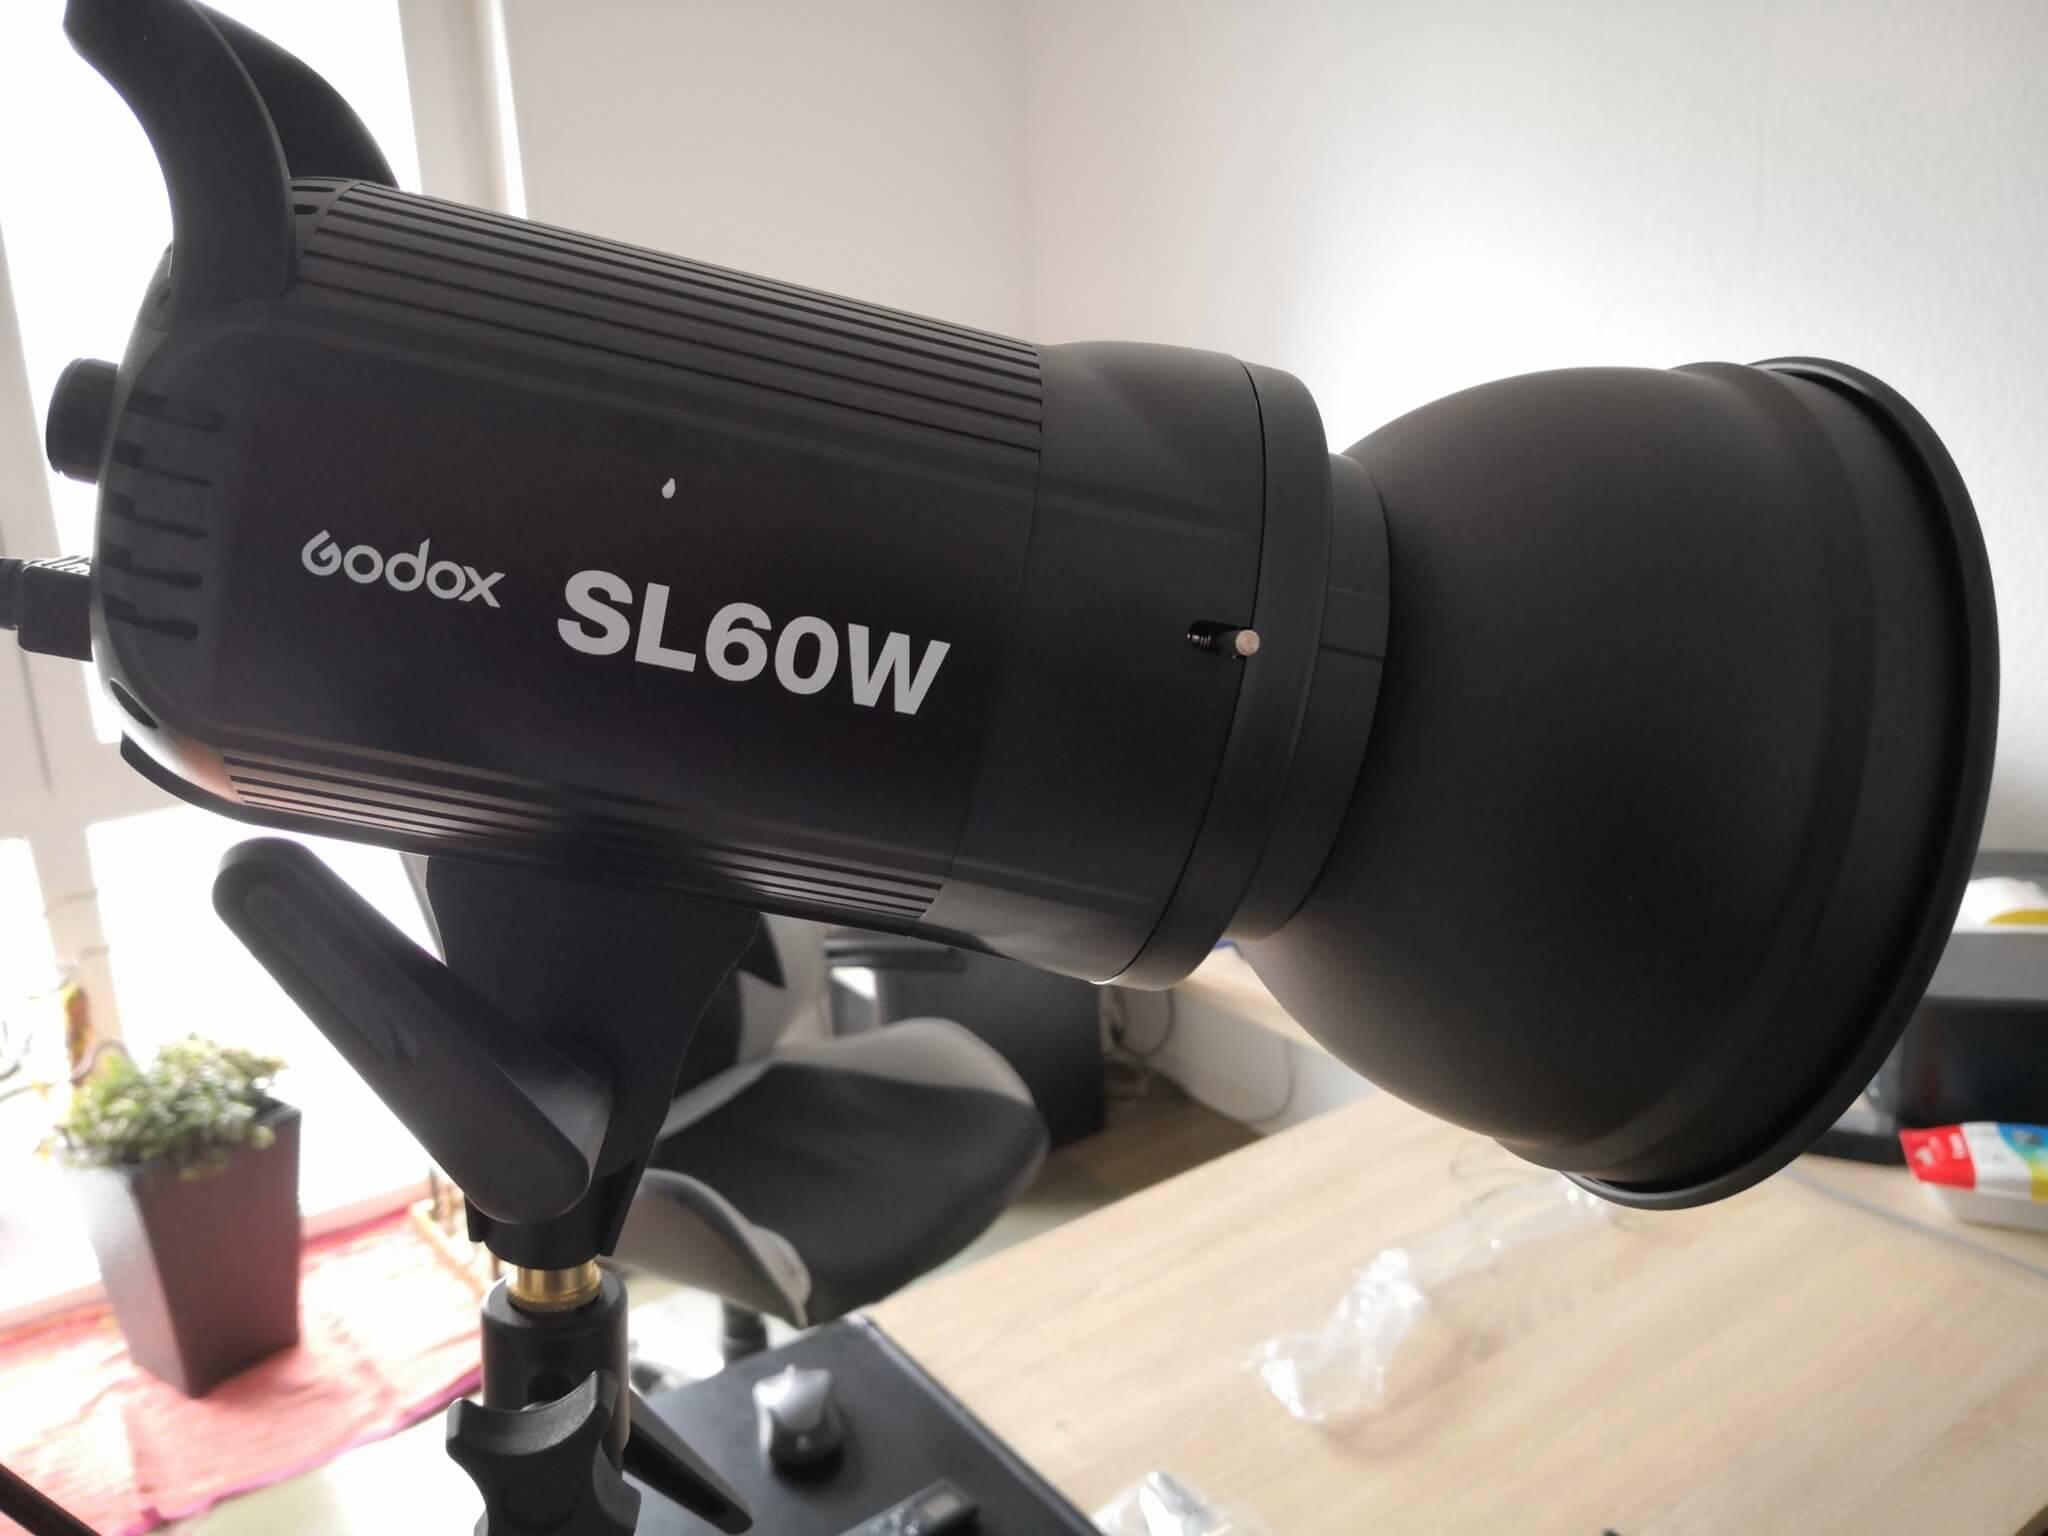 Neewer NL 660 vs. Godox SL 60W